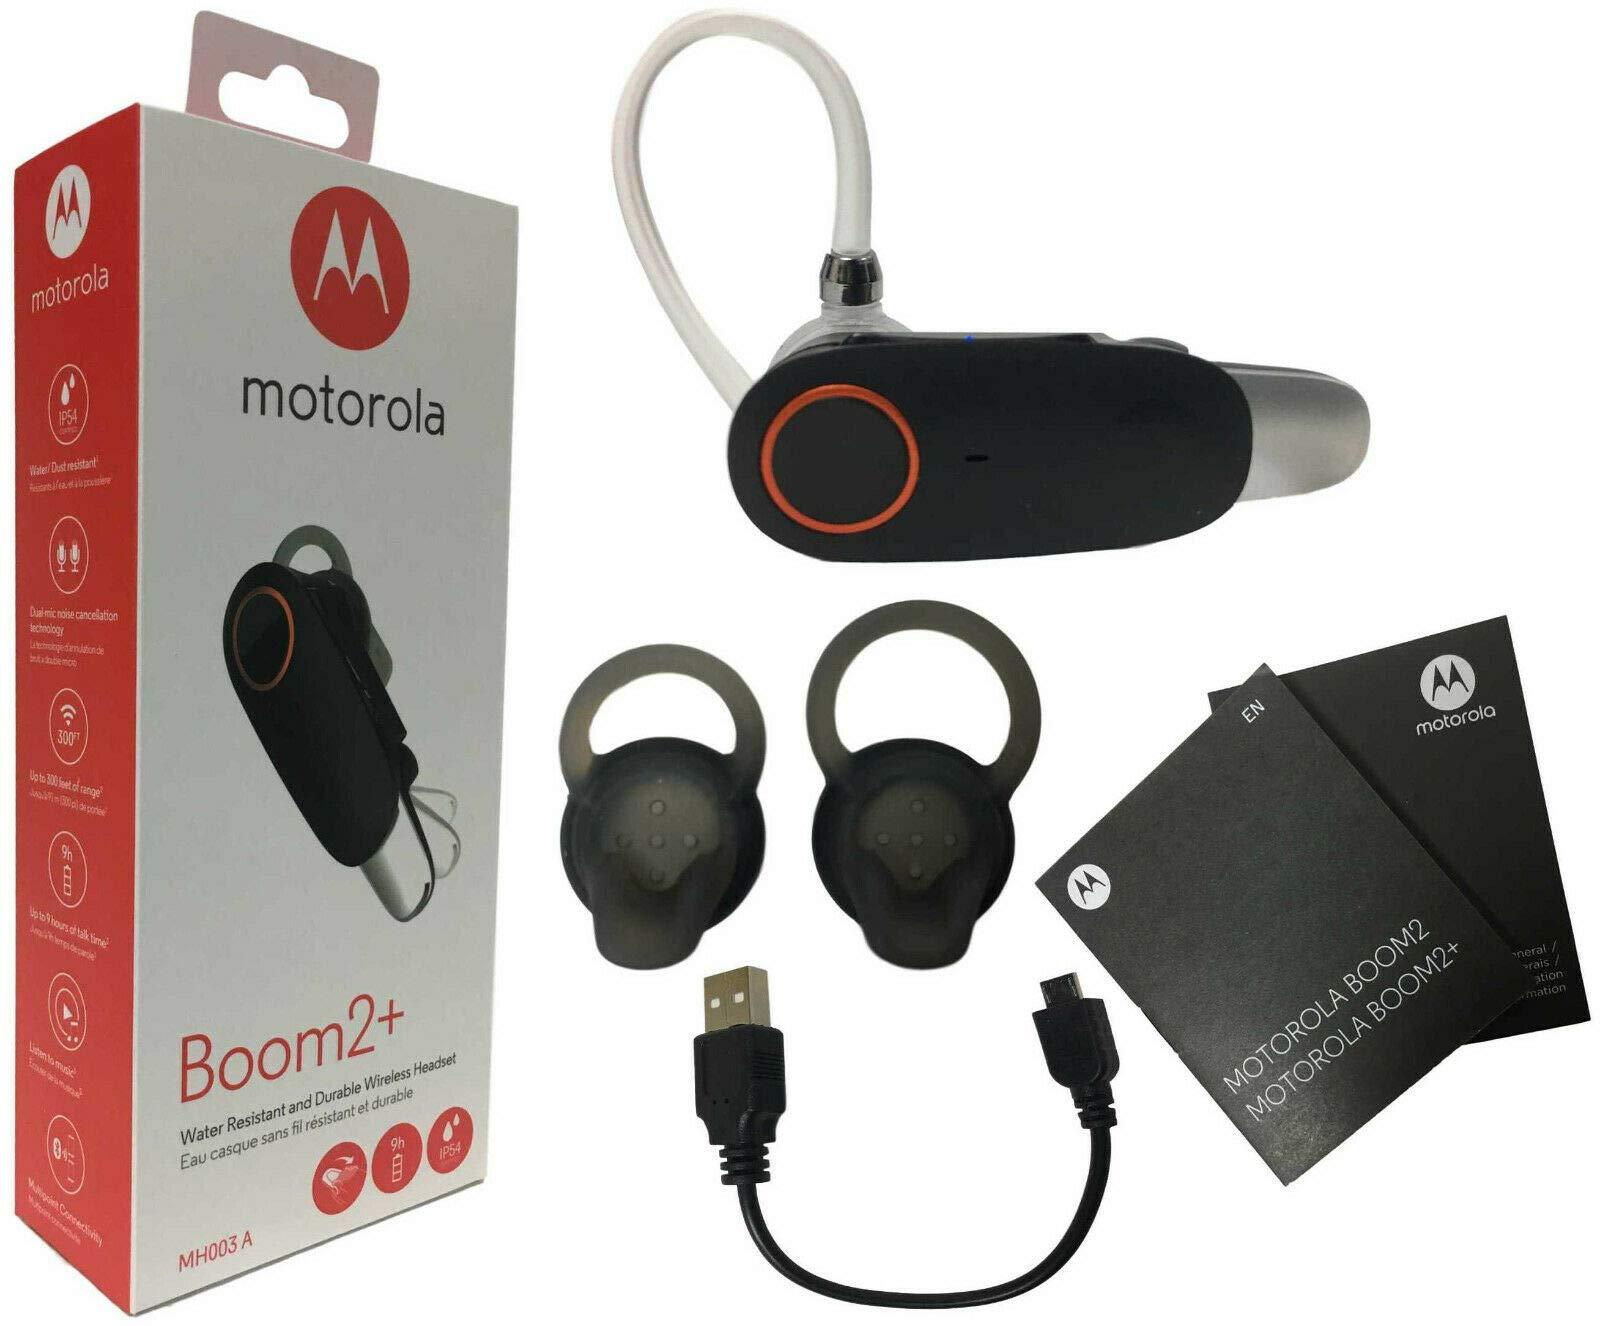 Motorola Boom 2+''HD Flip Bluetooth - Water Resistant Durable Wireless Headset W/Car Charger, (US Retail Packing by Motorola &Car KIT